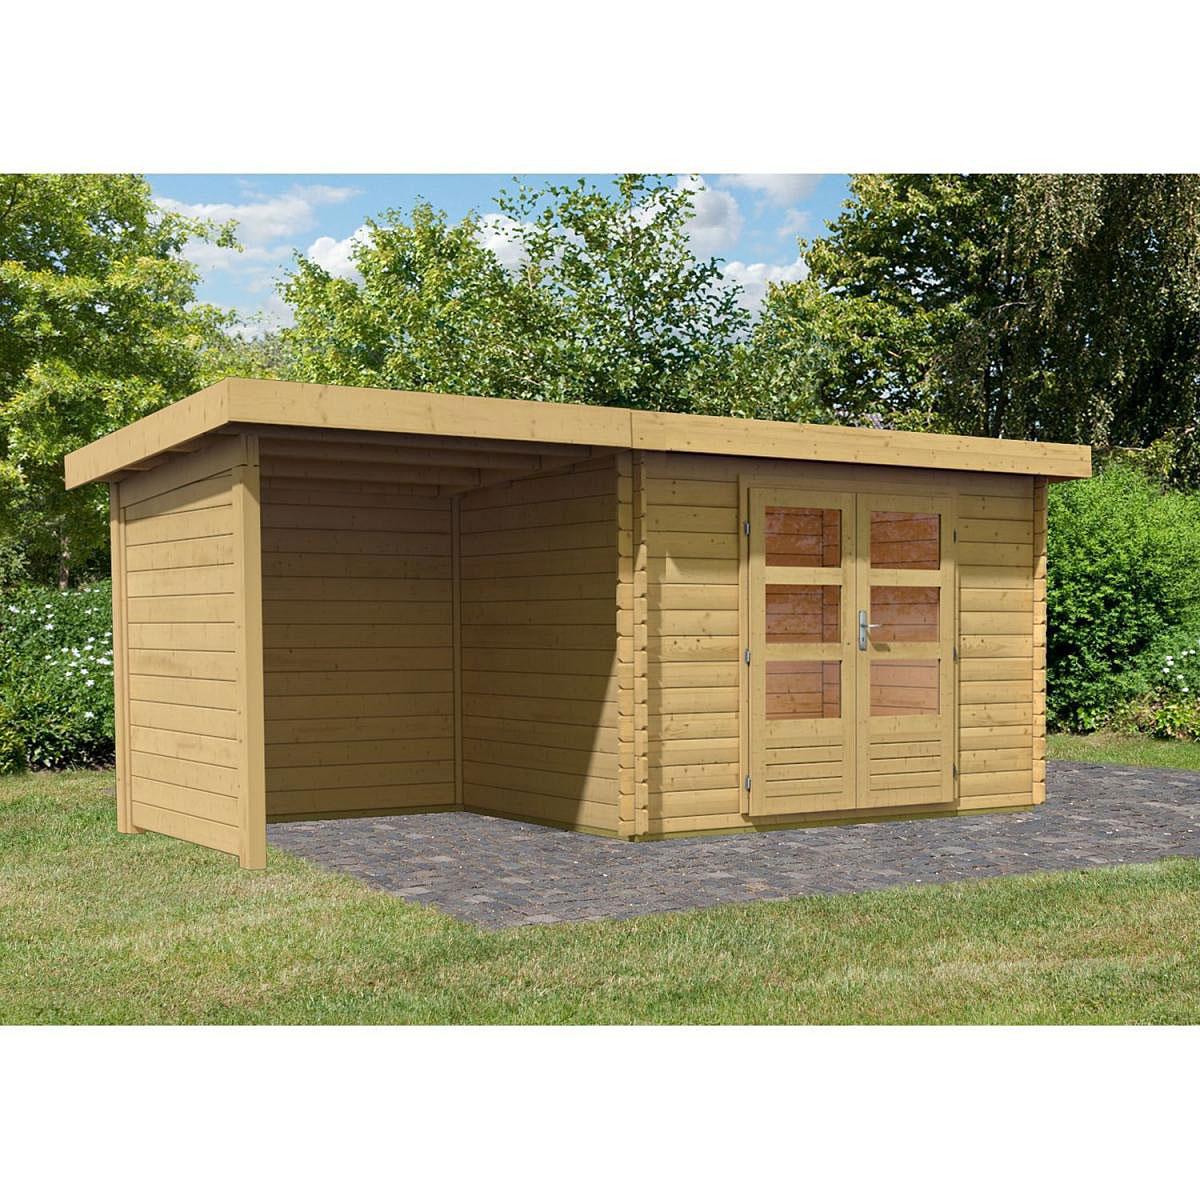 Woodfeeling Bastrup 3 Gartenhaus, inkl. Schleppdach, Seiten- und Rückwand